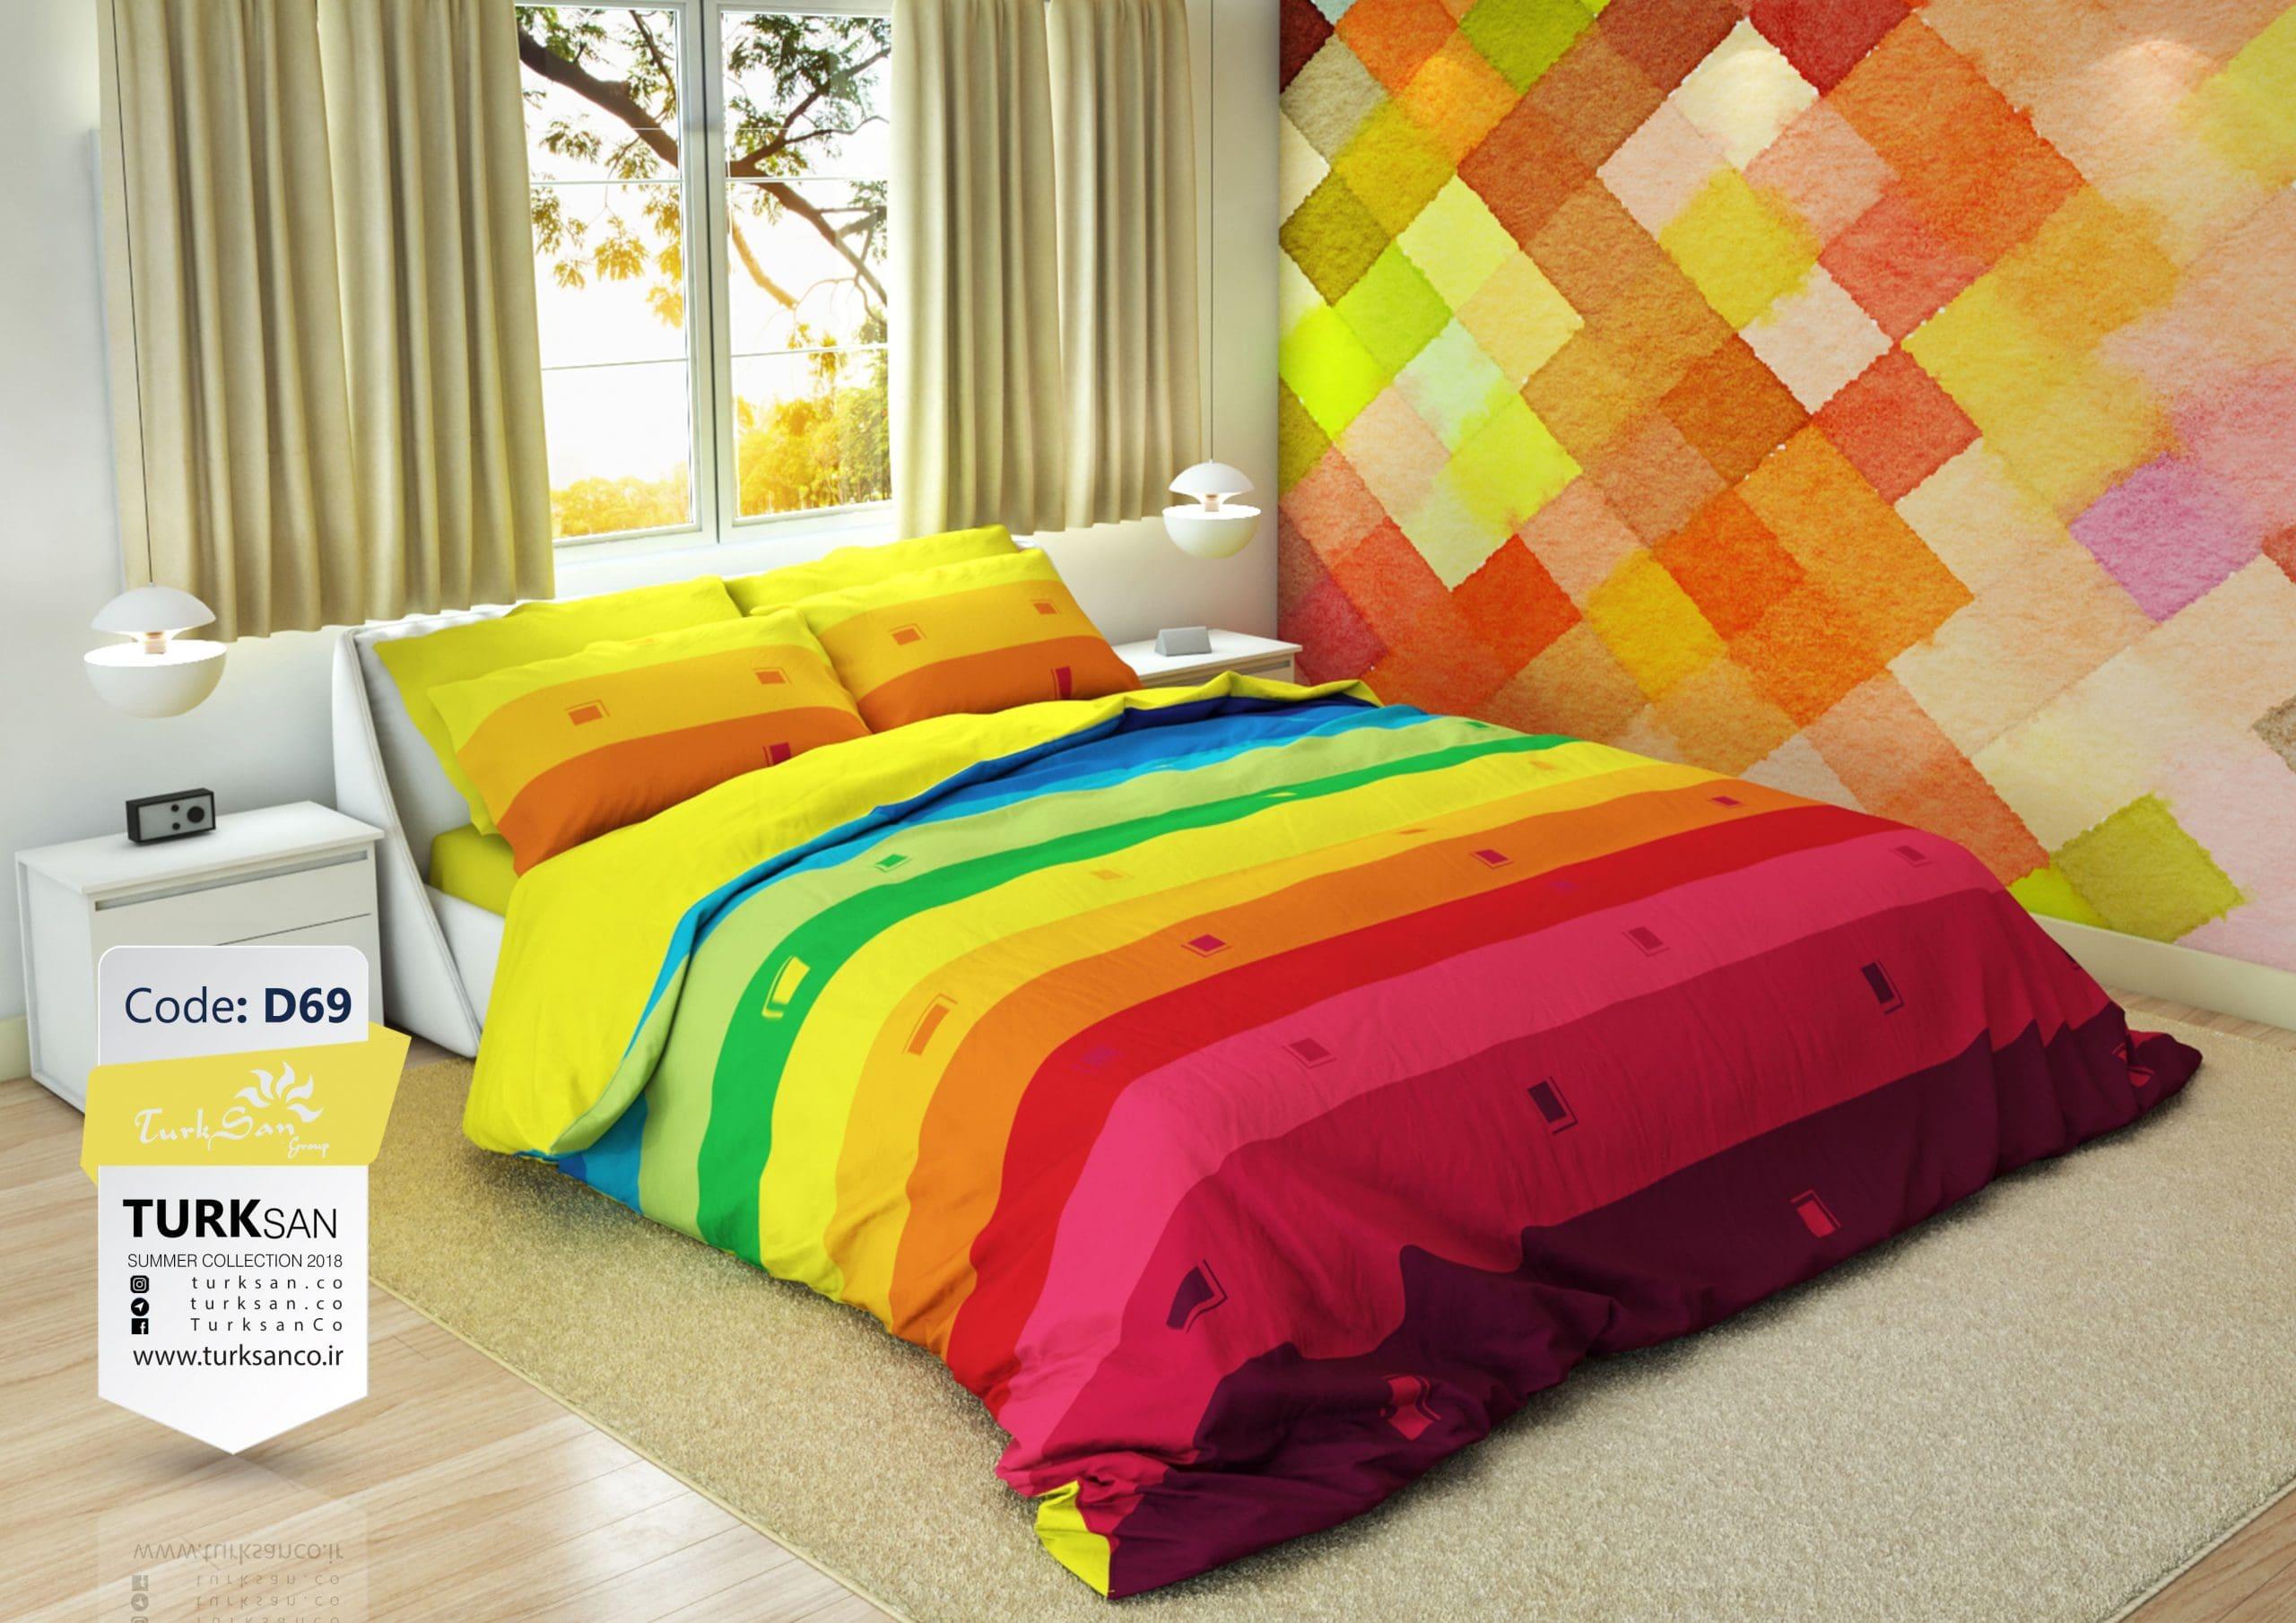 سرویس روتختی دونفره مدرن رنگارنگ انتخاب روتختی تخت کرم   کالای خواب بدروم